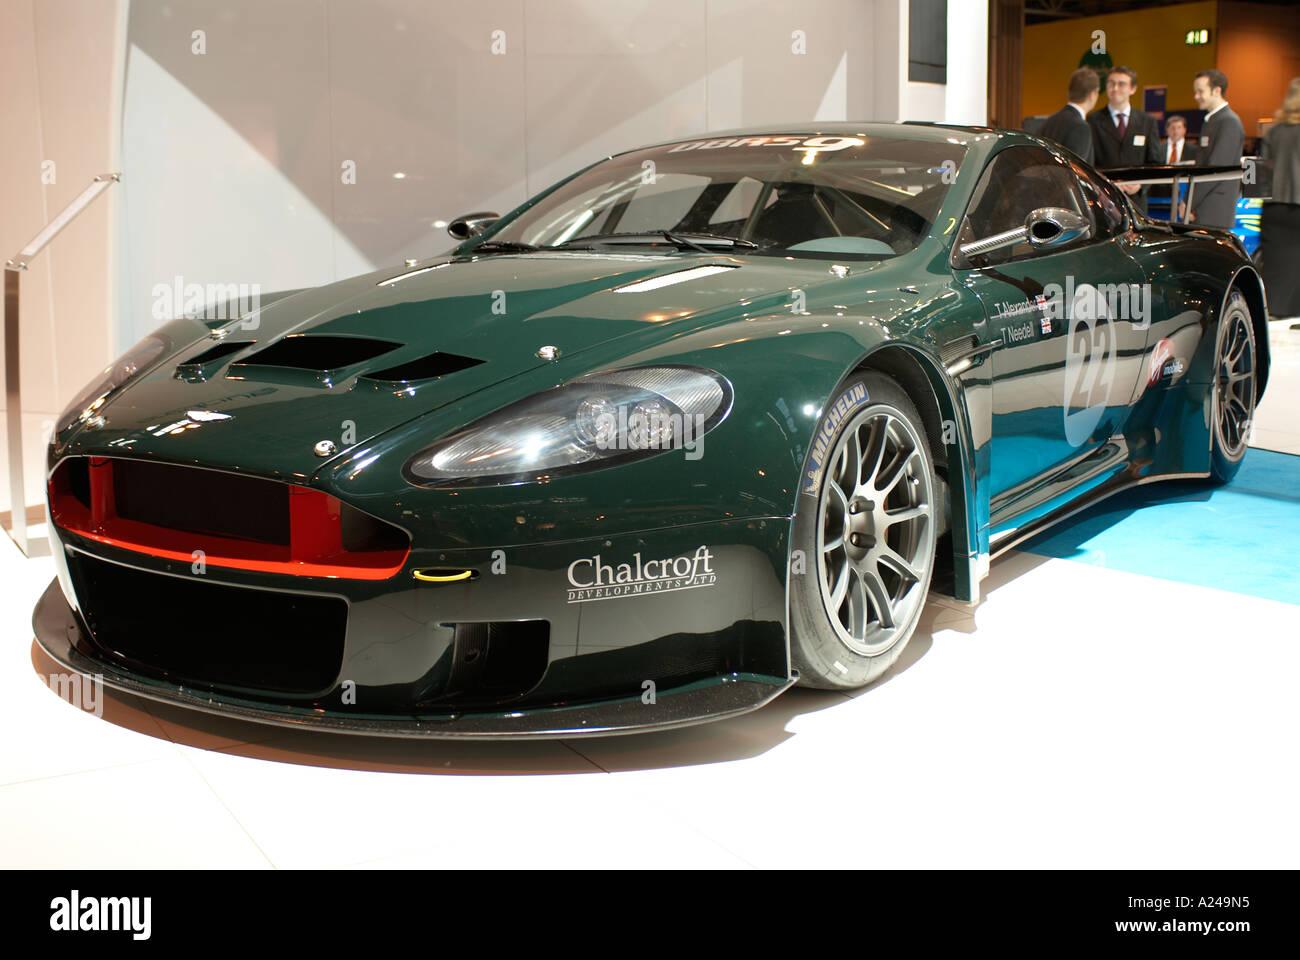 Aston Martin Dbrs9 Pictured At The Autosport International Show Stock Photo Alamy